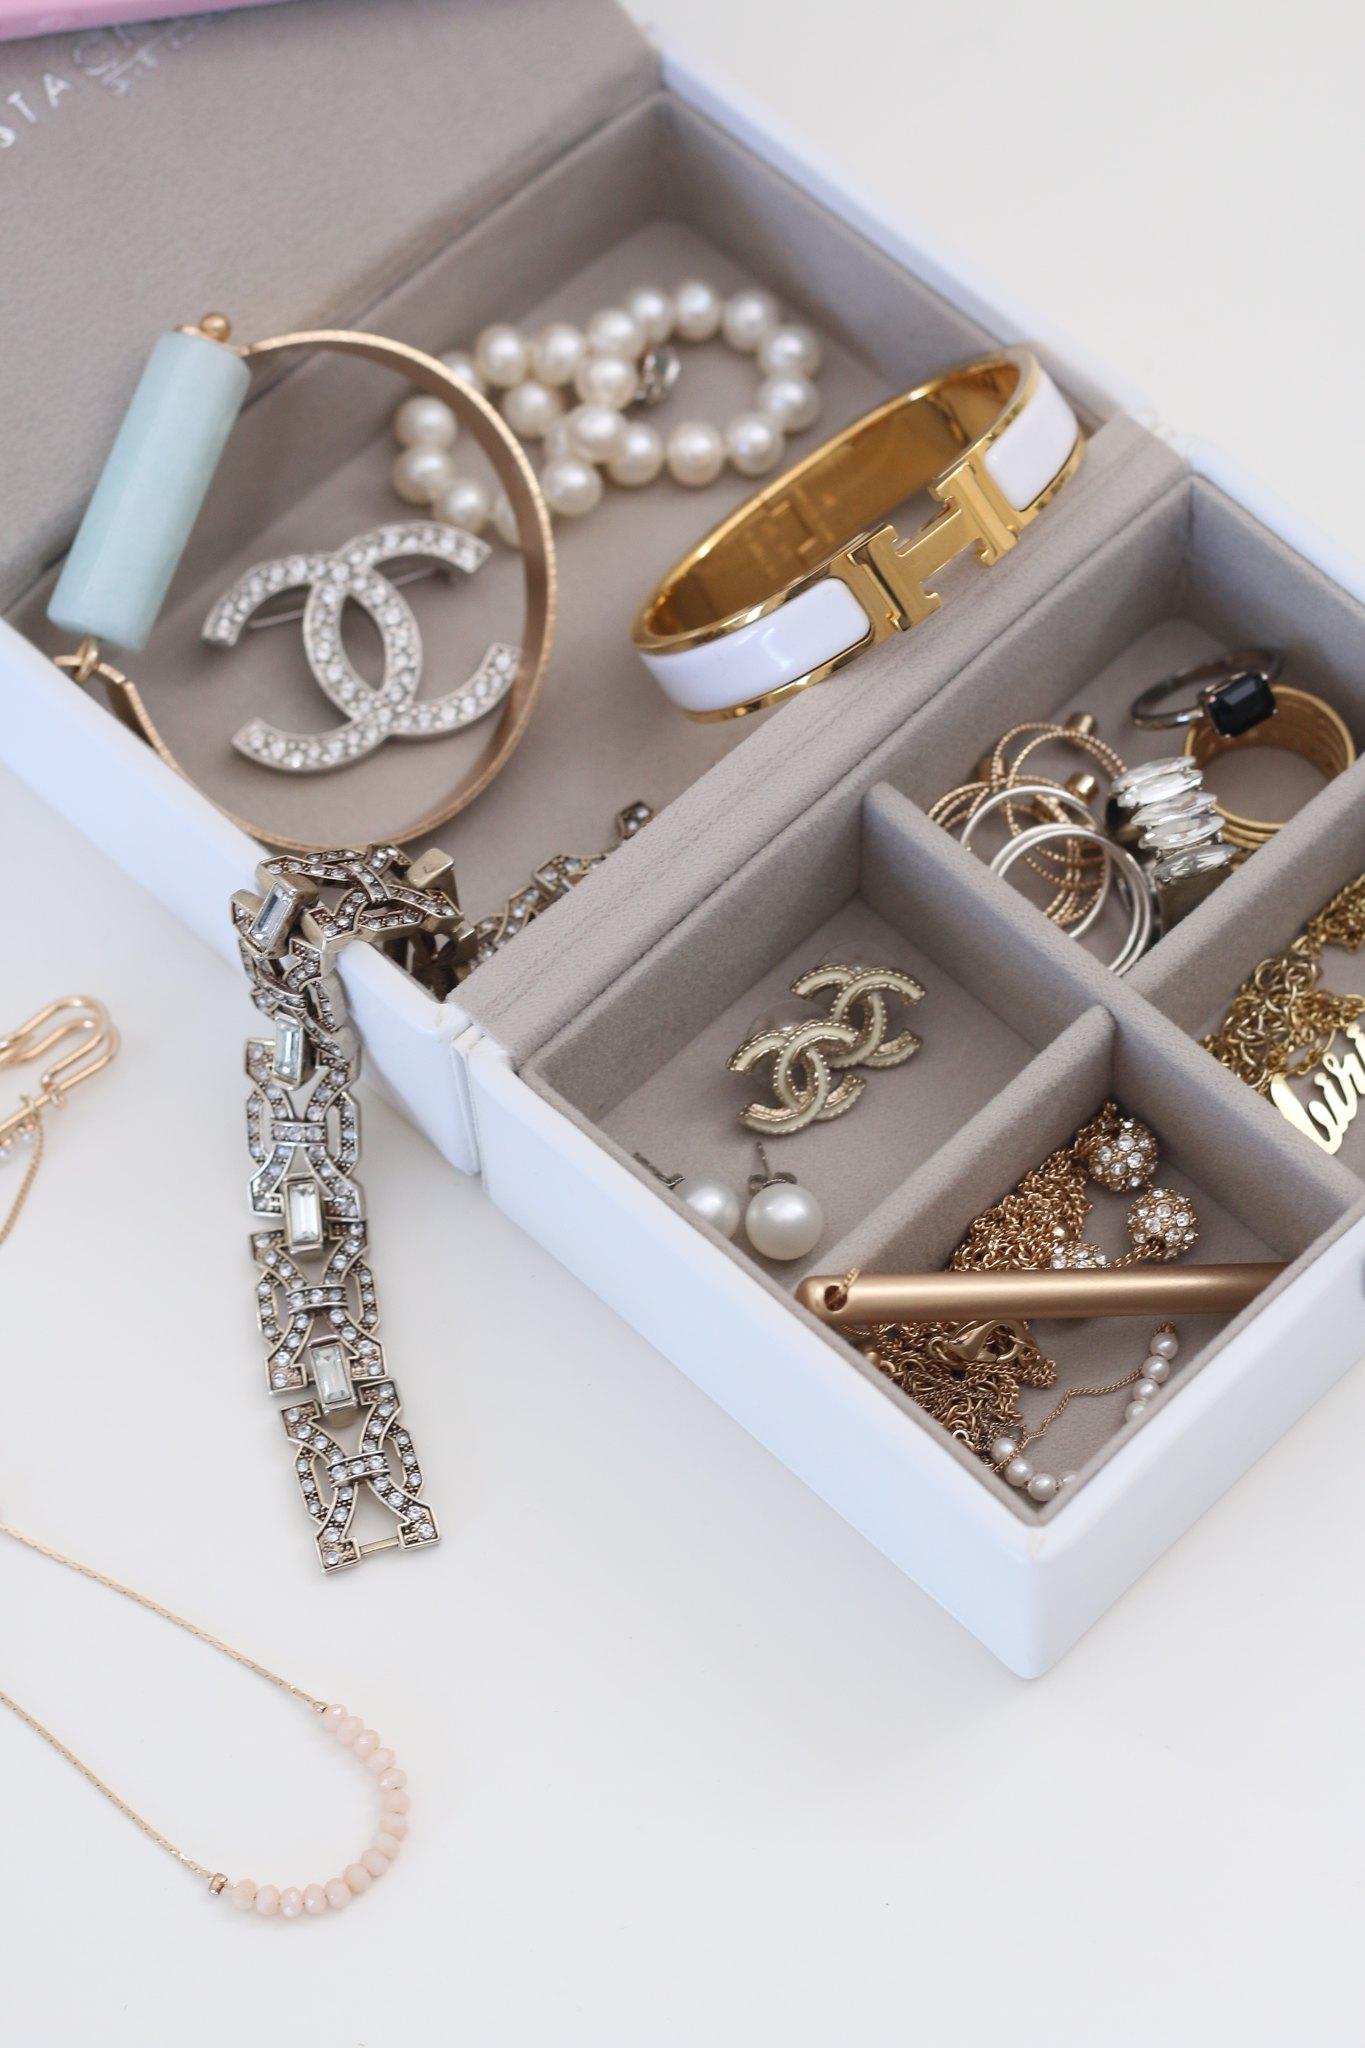 How to pack jewelry, travel, simplyxclassic, jewelry storage, watch organizer, fashion blogger, mommy blog, orange county